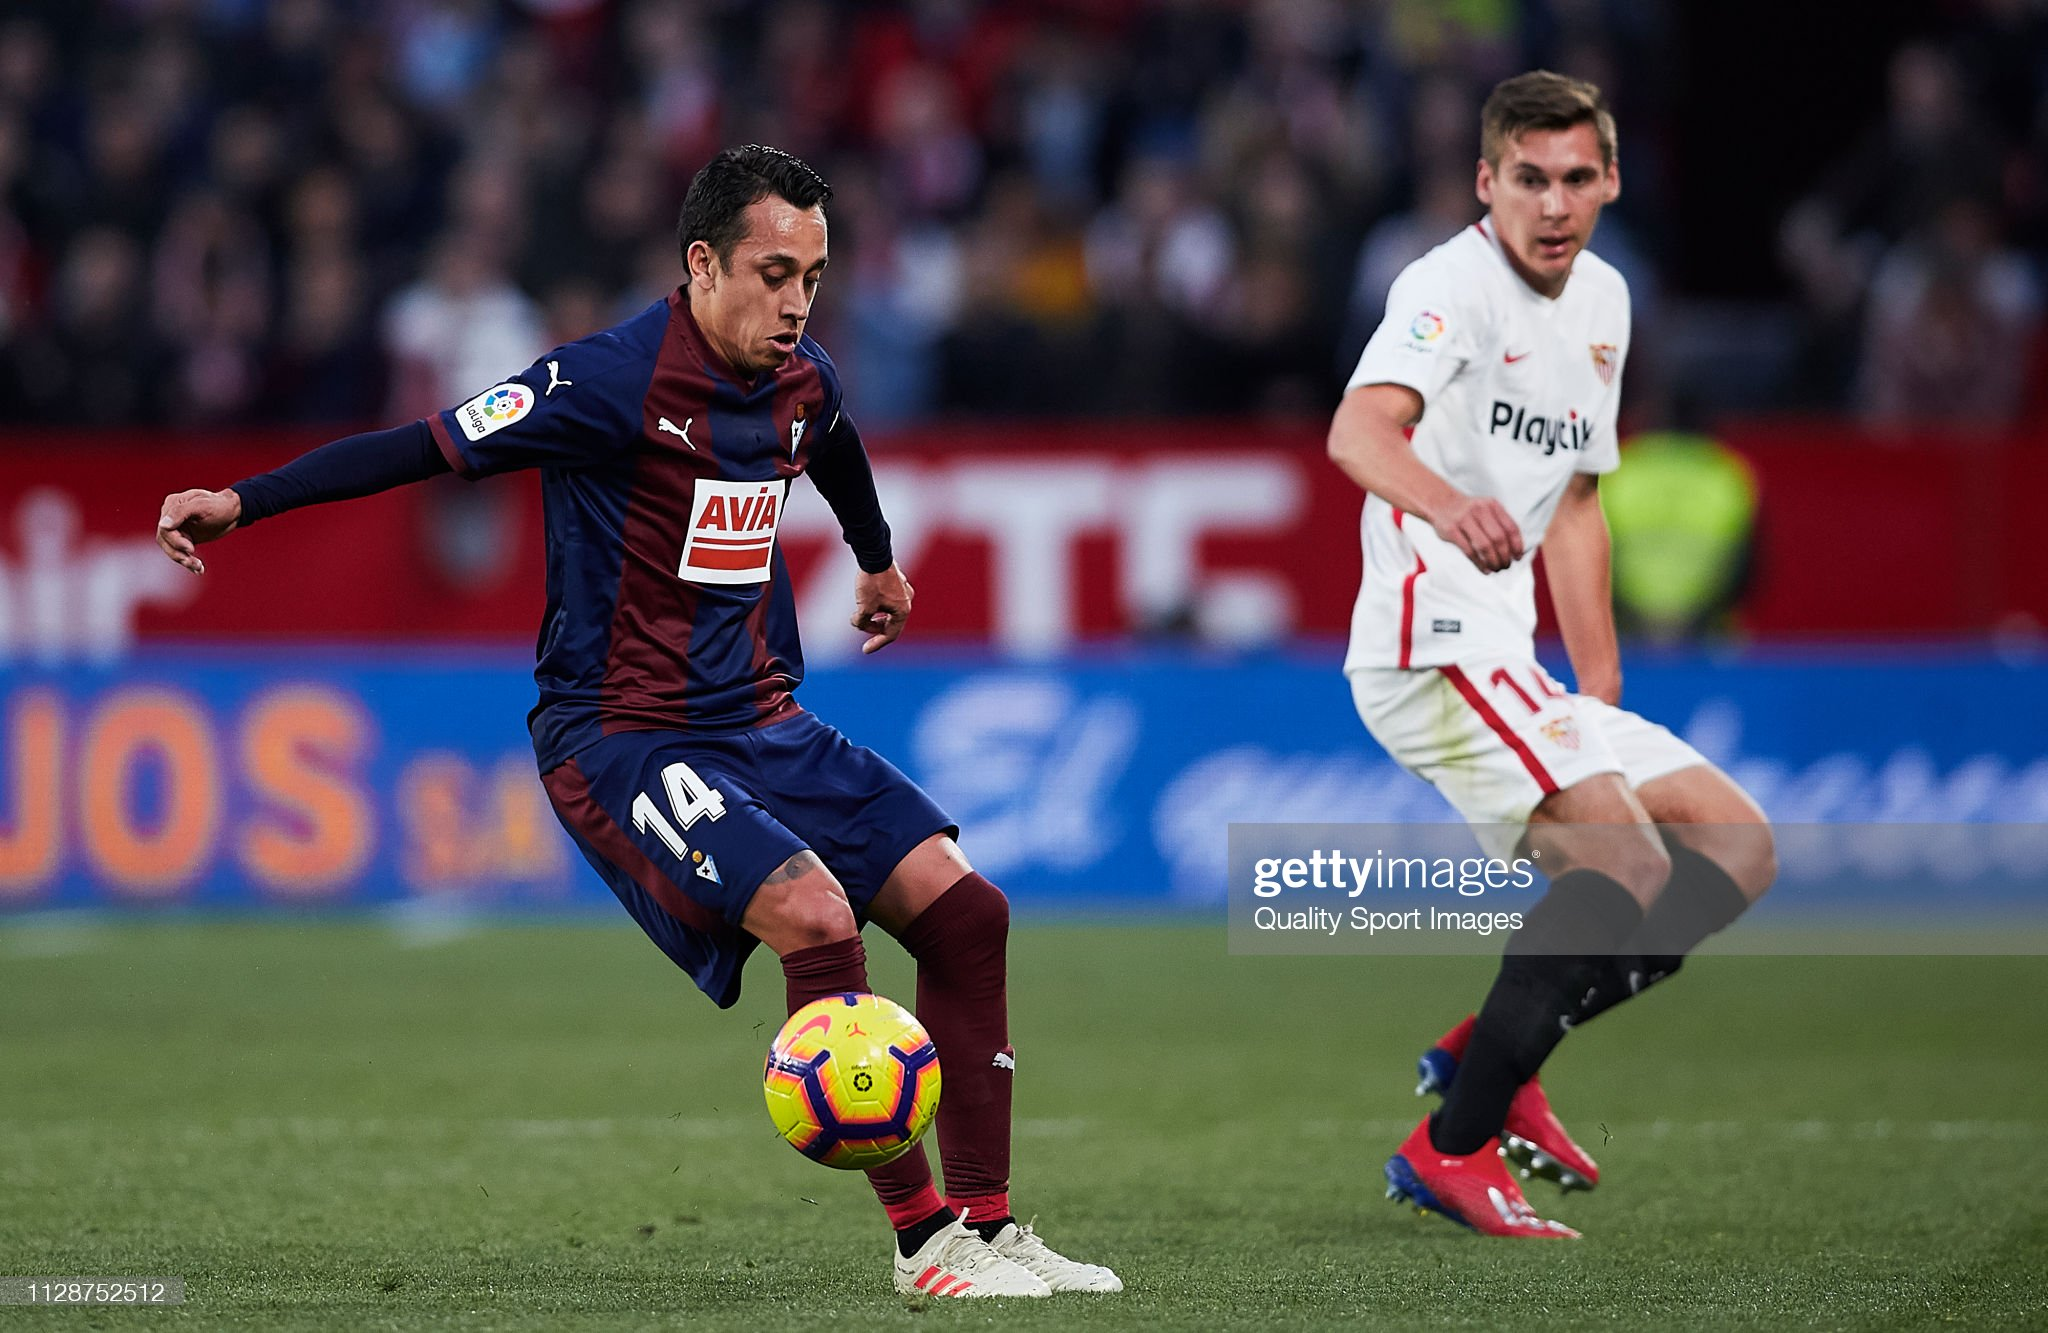 Eibar v Sevilla preview, prediction and odds